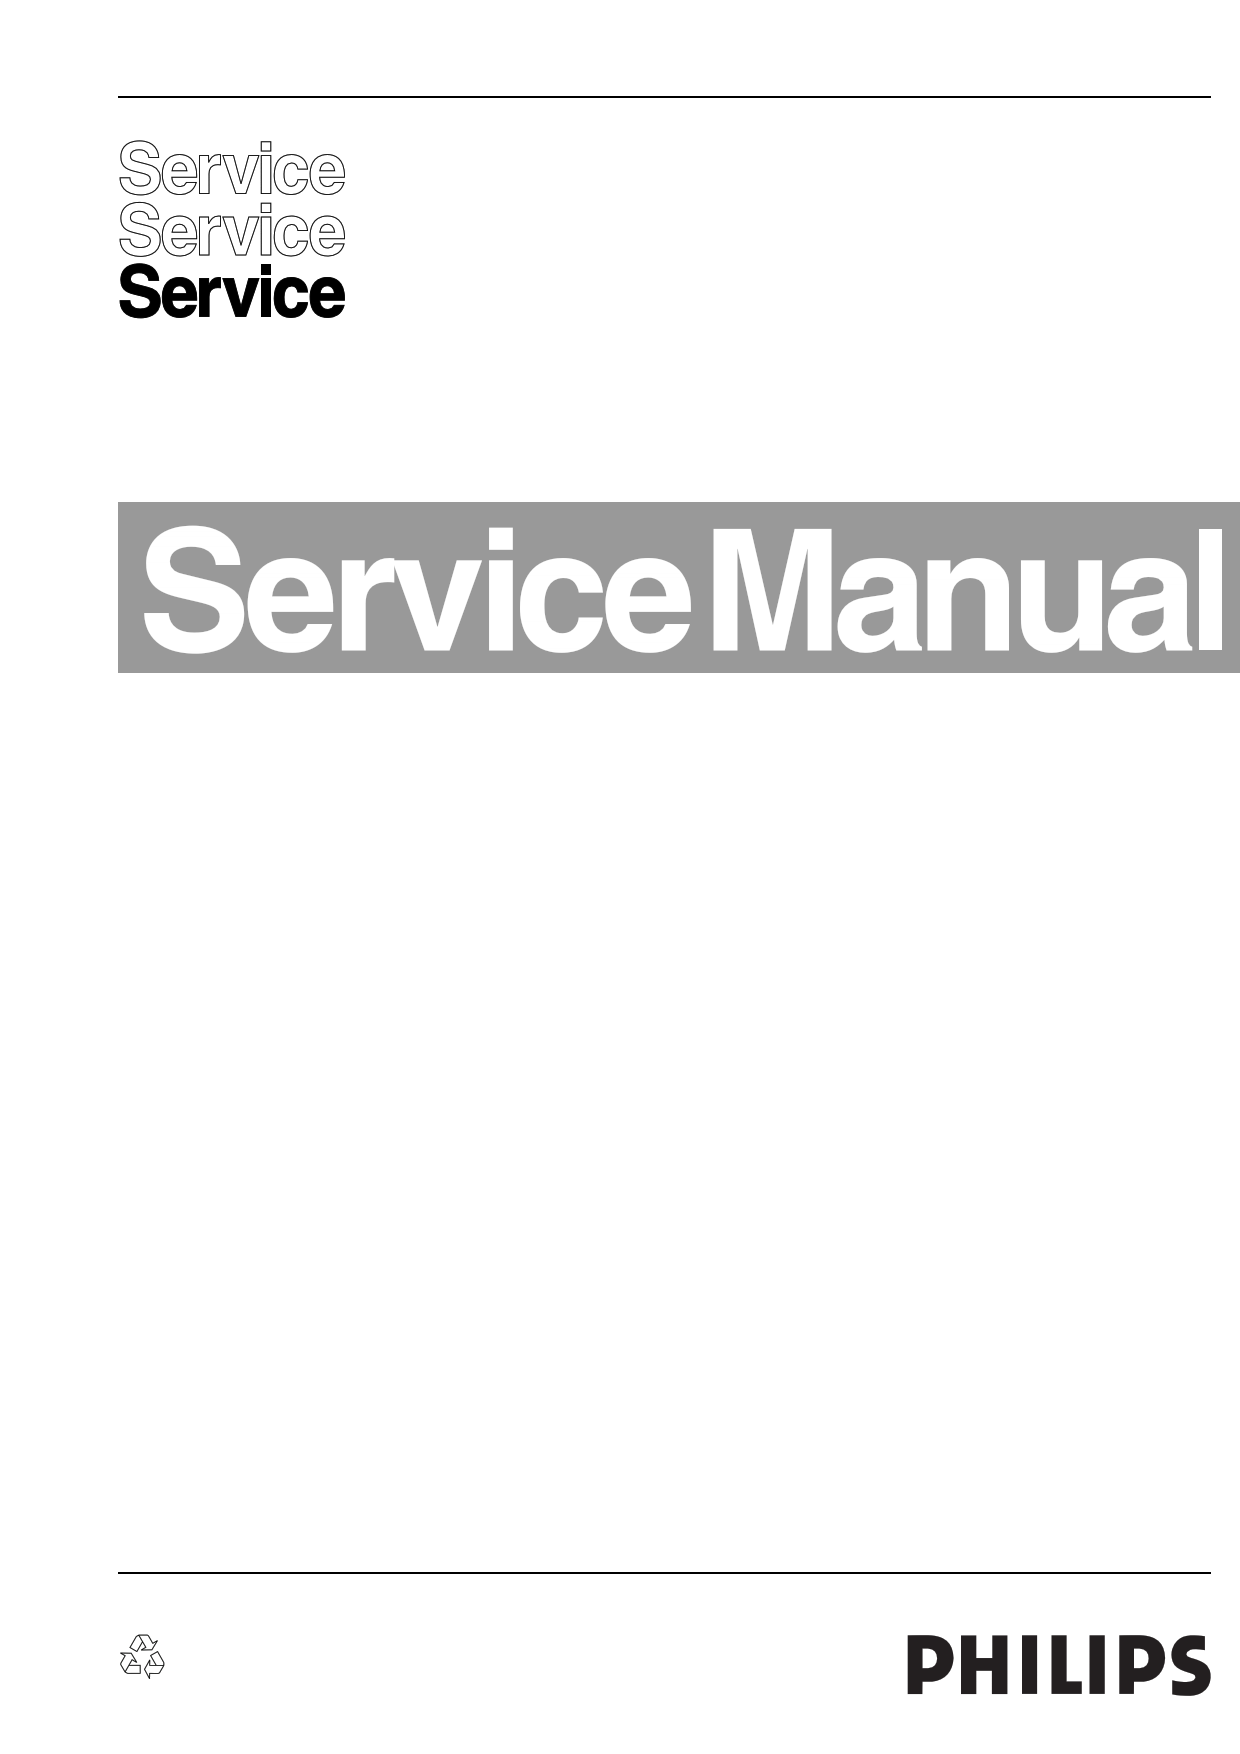 S42AX-YD02 데이터시트 및 S42AX-YD02 PDF